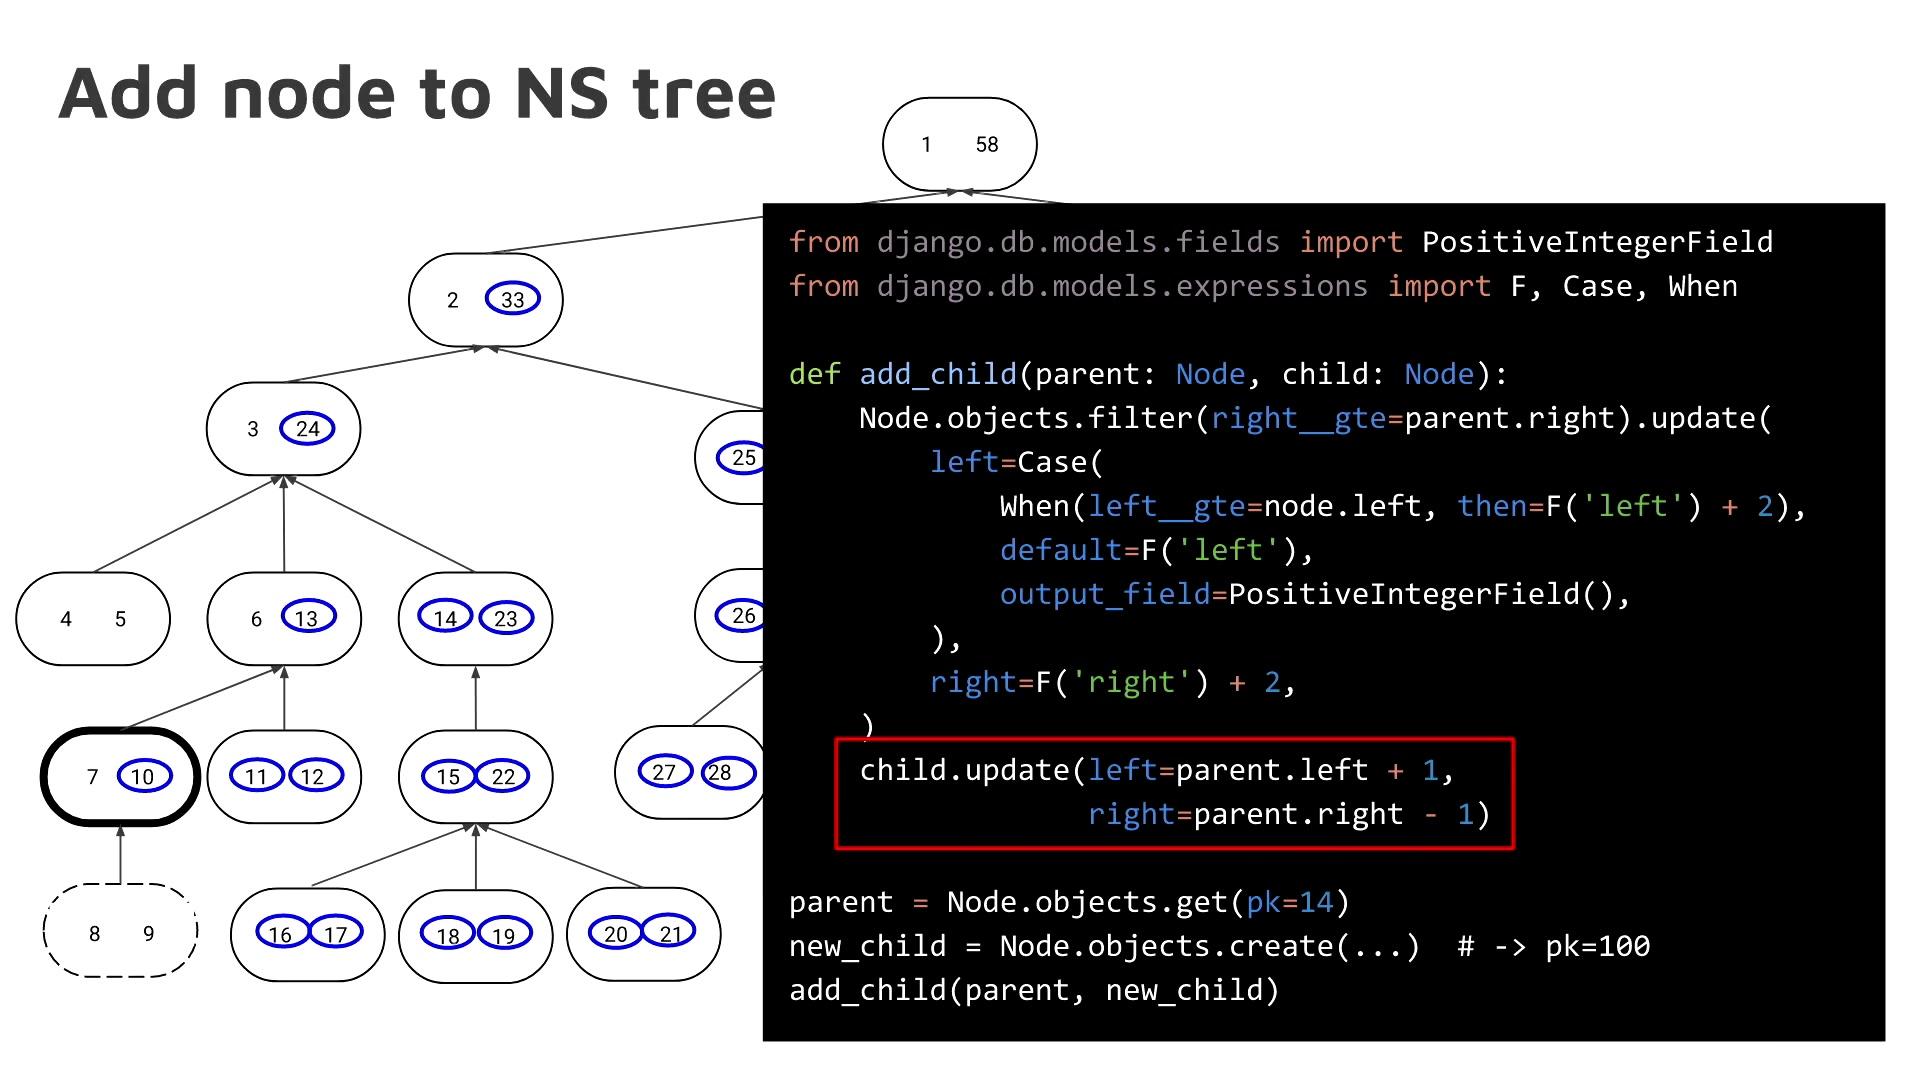 media ccc de - Representing Hierarchies in Relational Databases